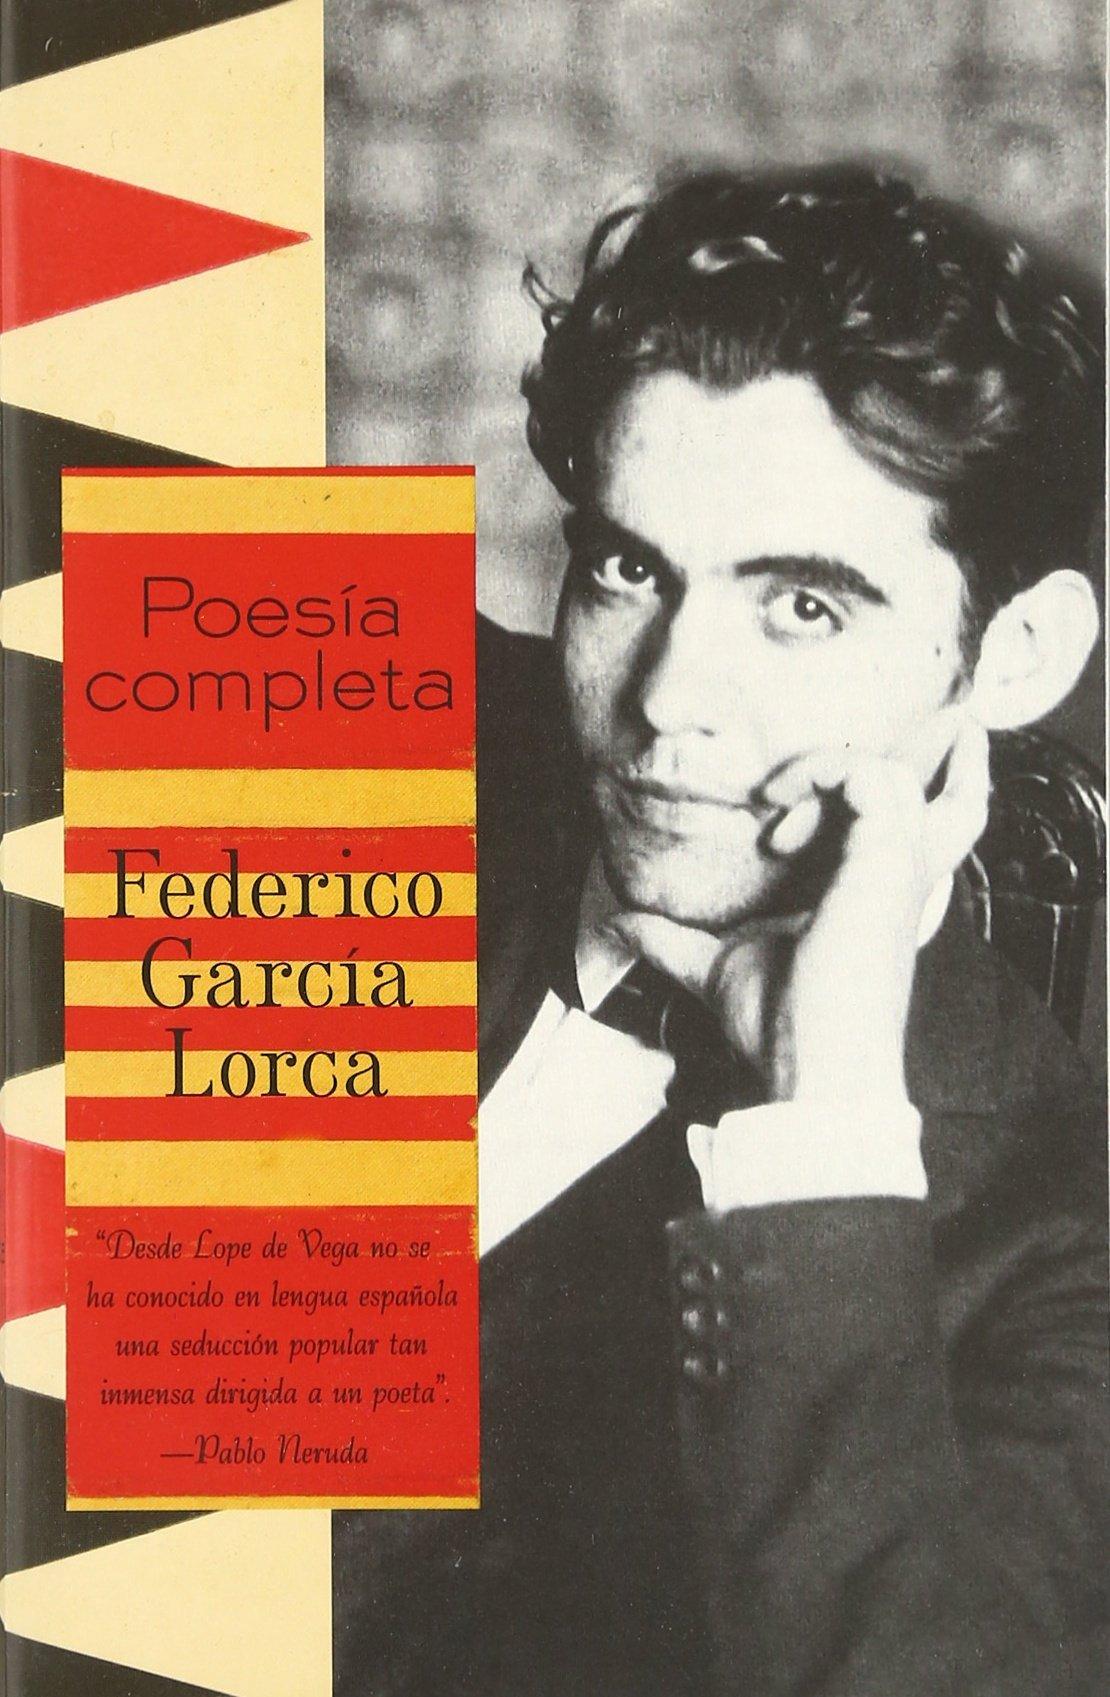 Poesia completa Spanish Federico Garc%C3%ADa product image